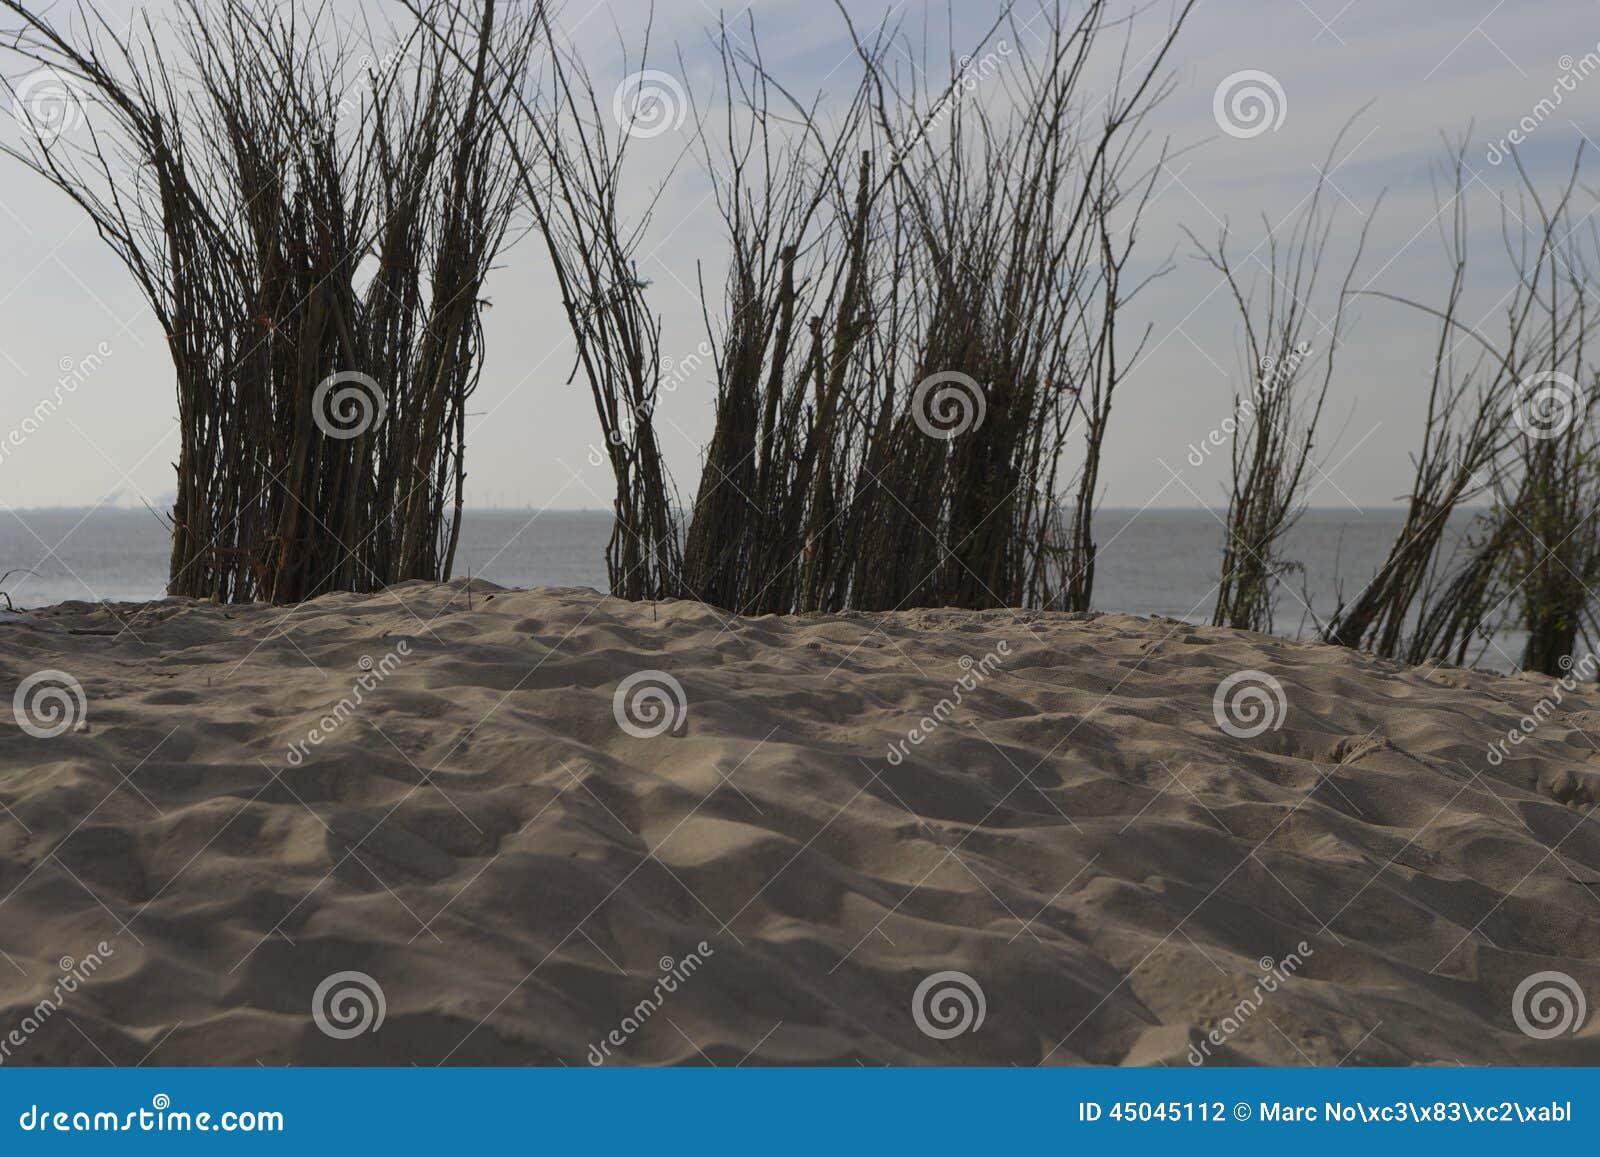 Dessus de la Mer du Nord de colline de sable